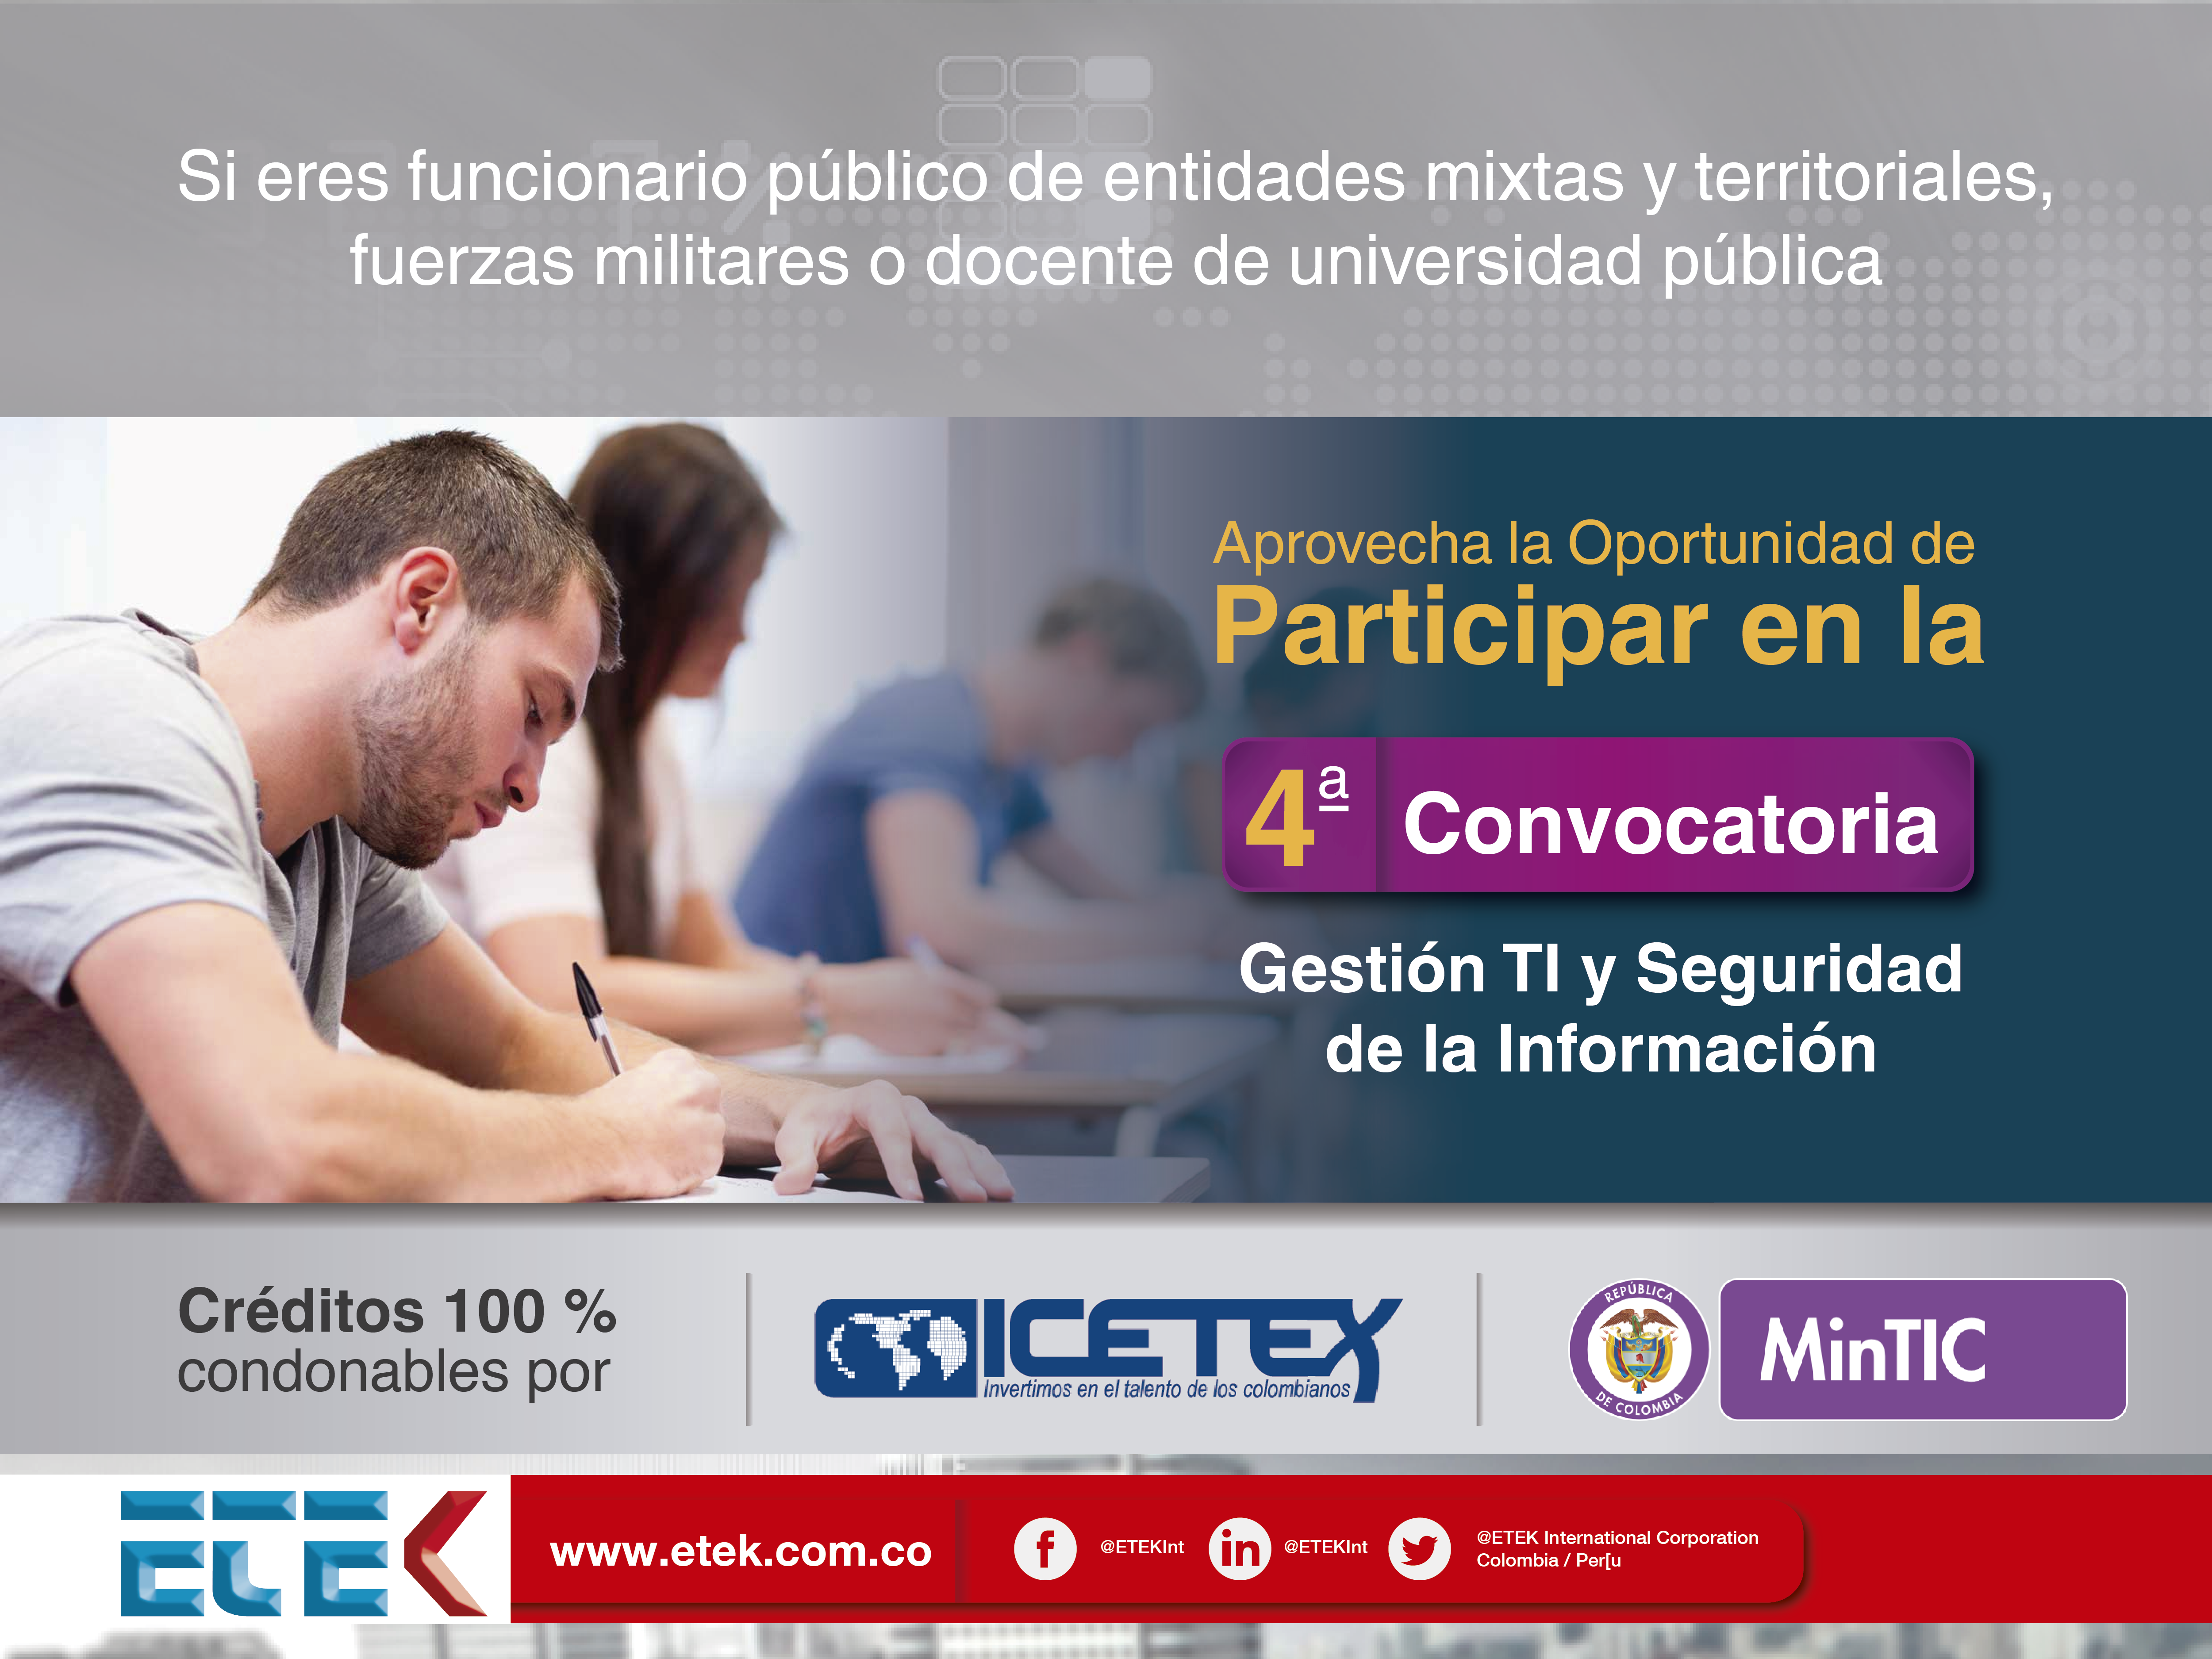 Mintic - Etek International (1)